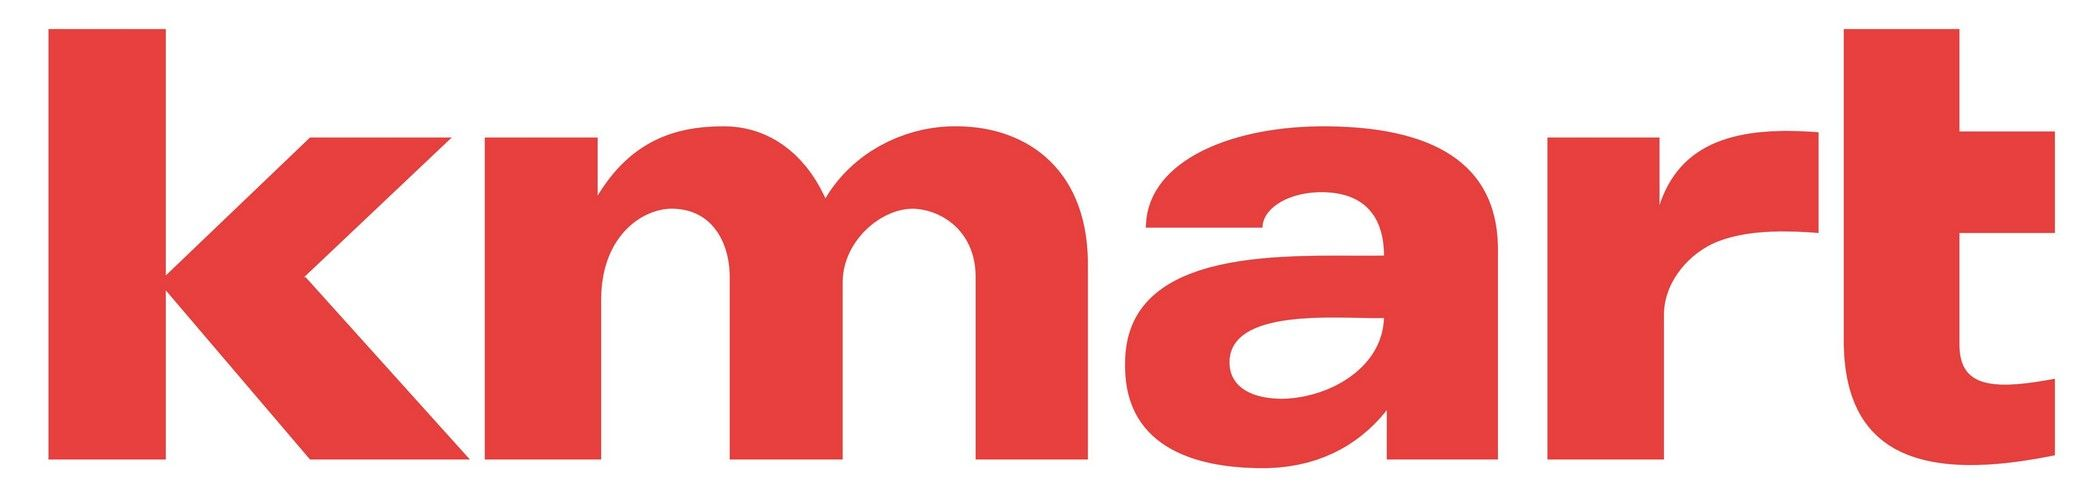 Kmart Logo   Clothing Company Logos   Pinterest   Logos ...